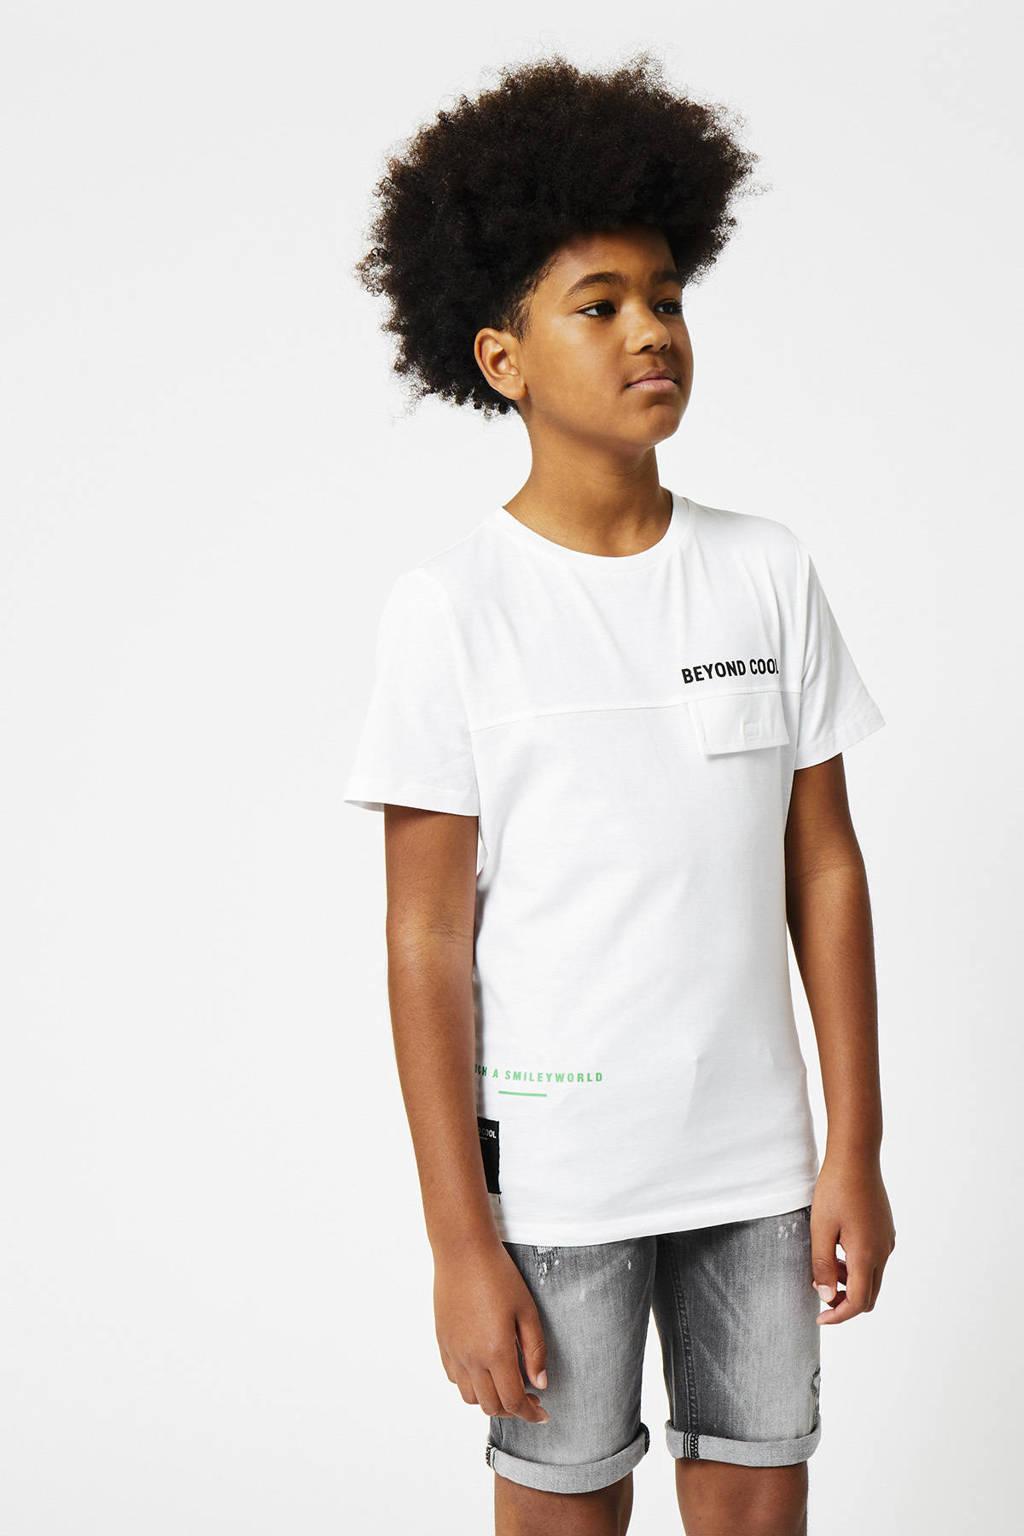 CoolCat Junior T-shirt Edyn coolcat x smiley world wit, Wit